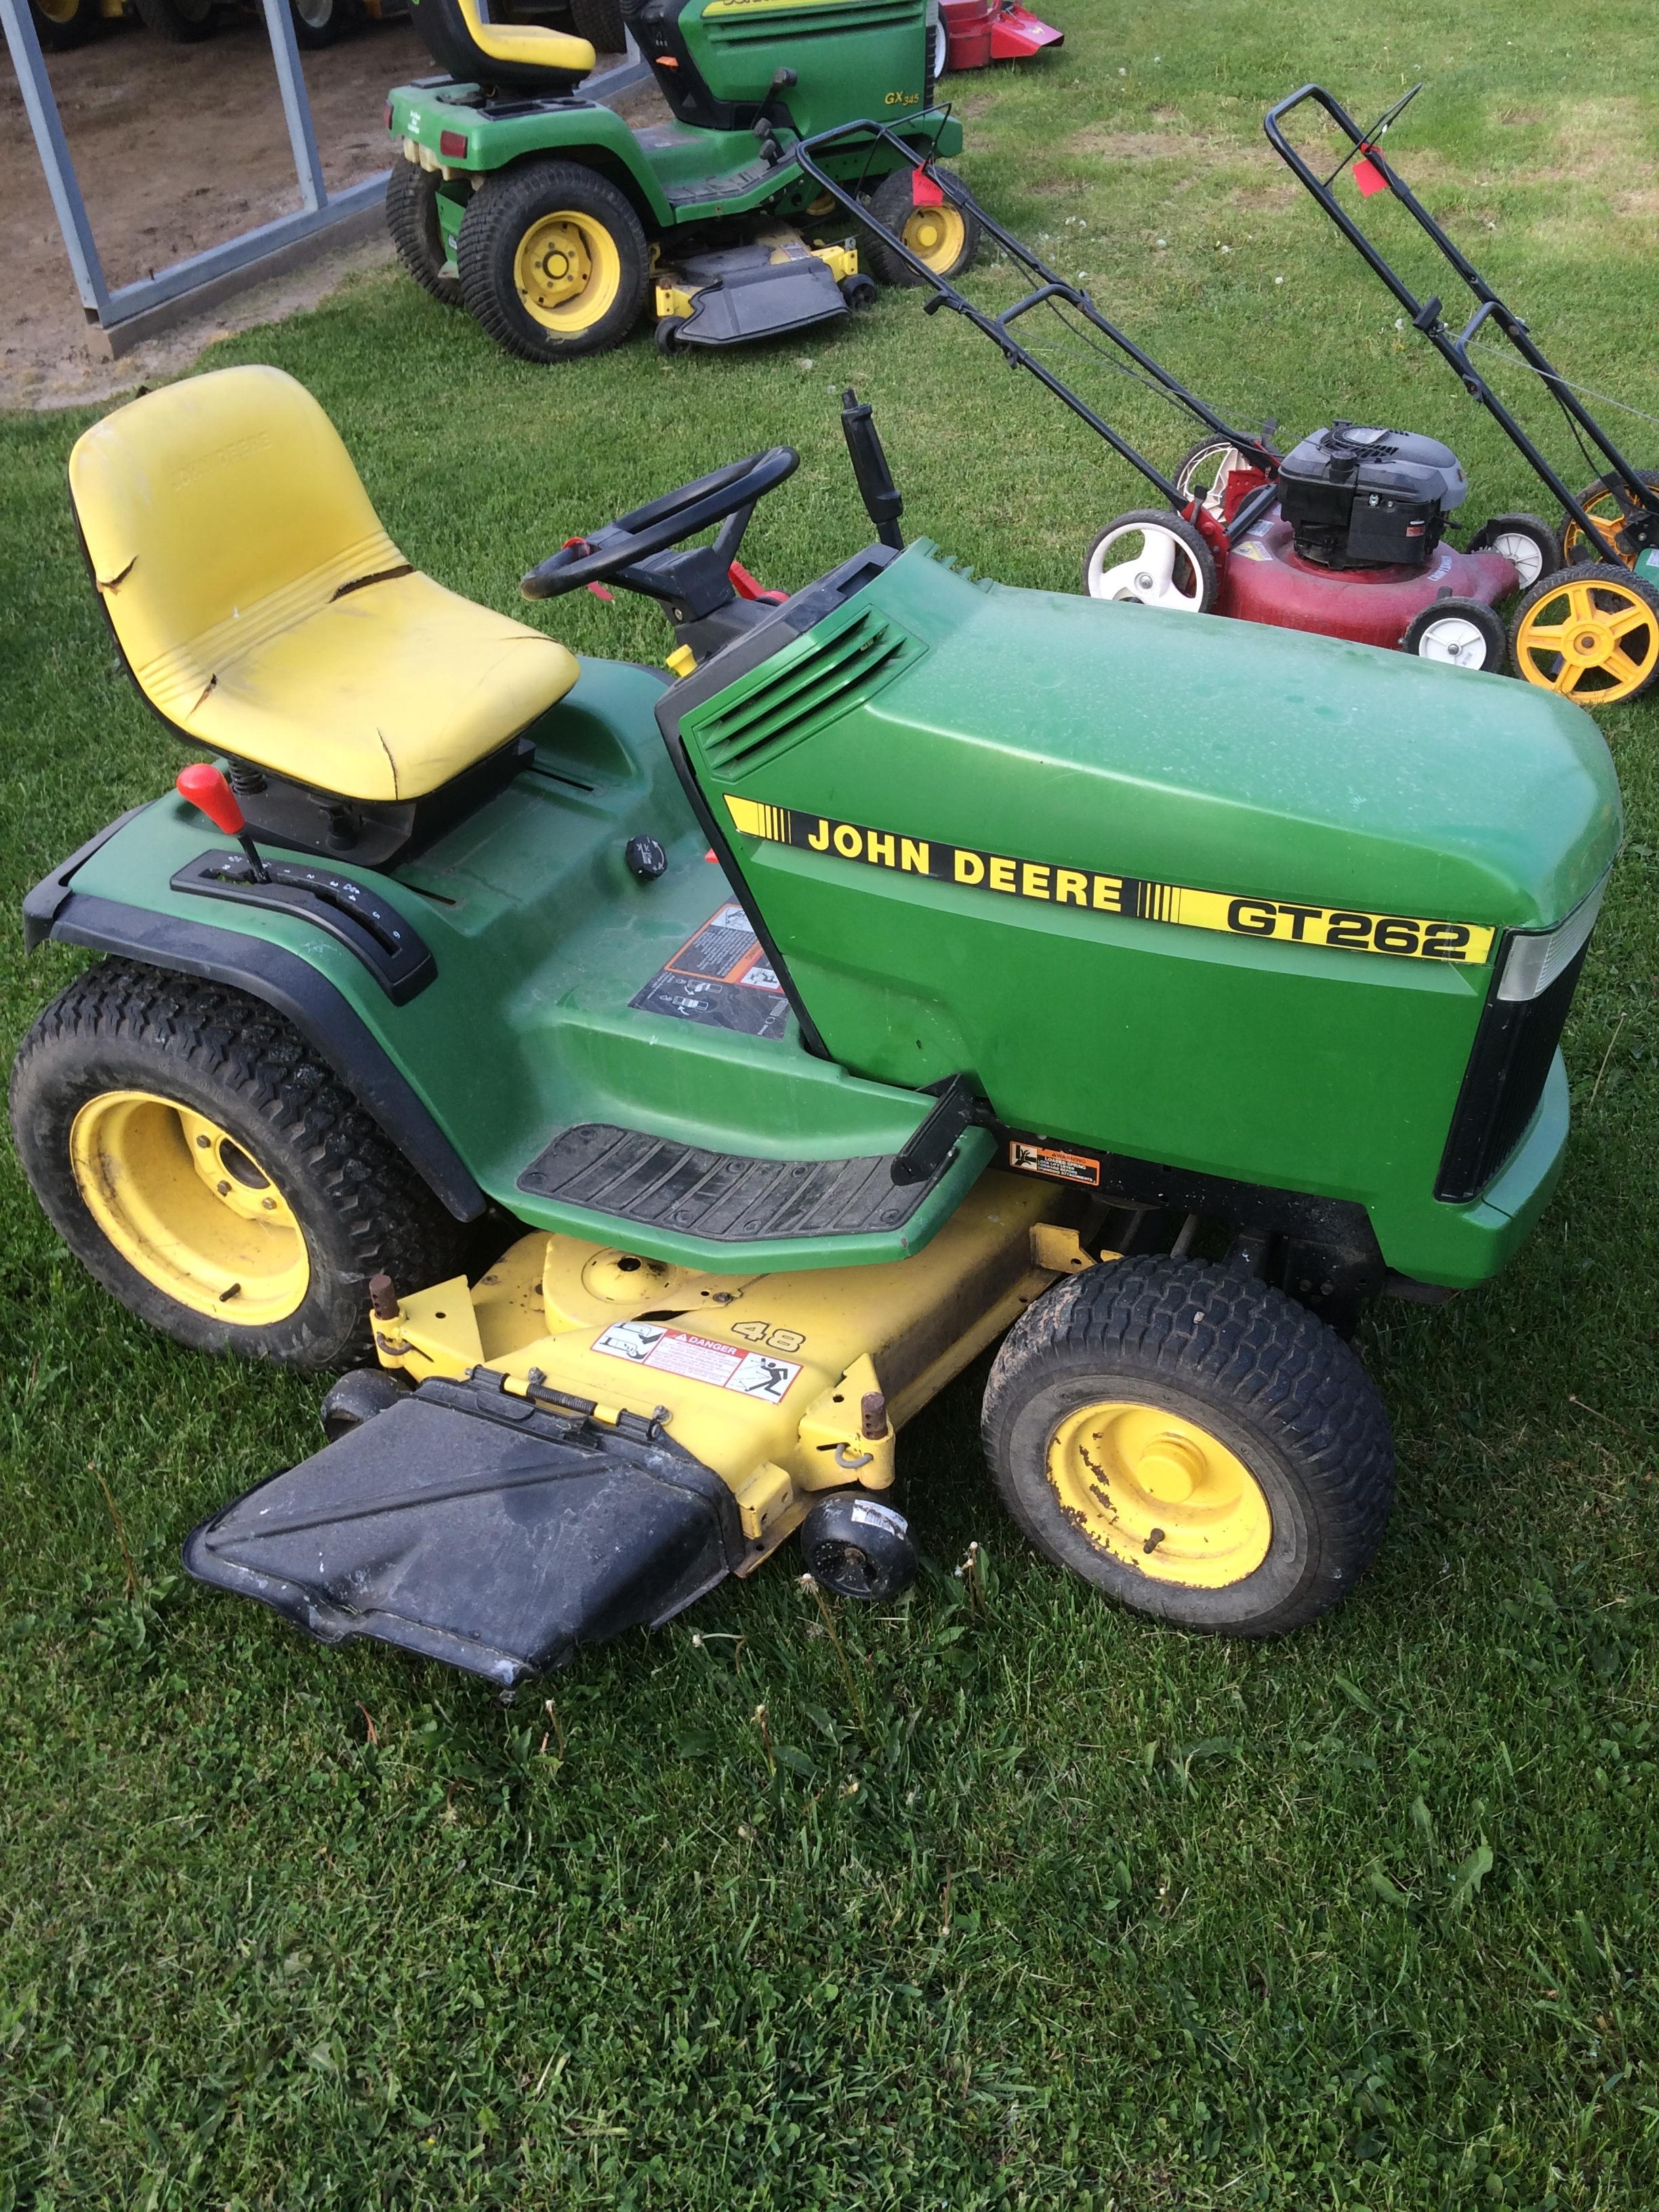 John Deere Gt262 : John deere gt doc s repair shop small engine sales